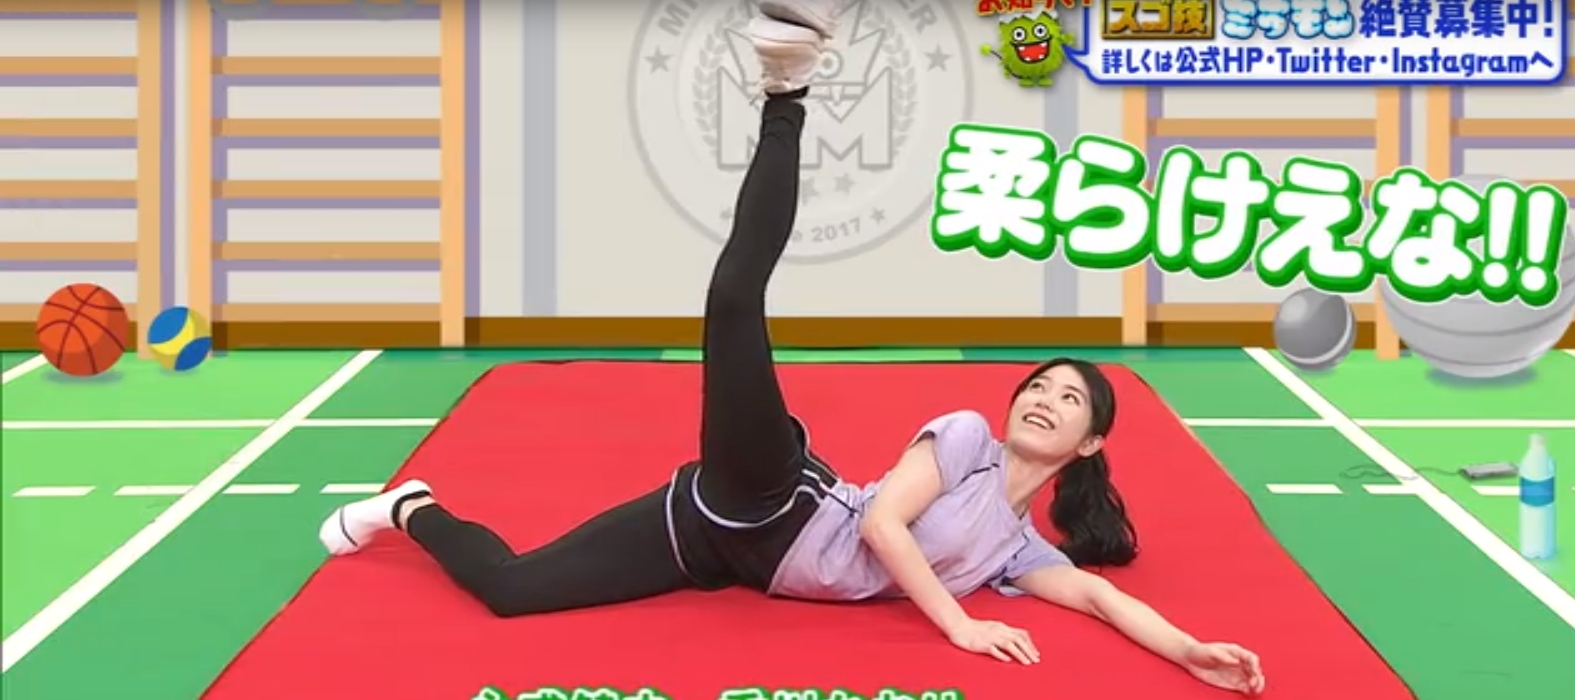 【AKB48】横山由依が次回のミライモンスターでセクシーストレッチ姿を公開www